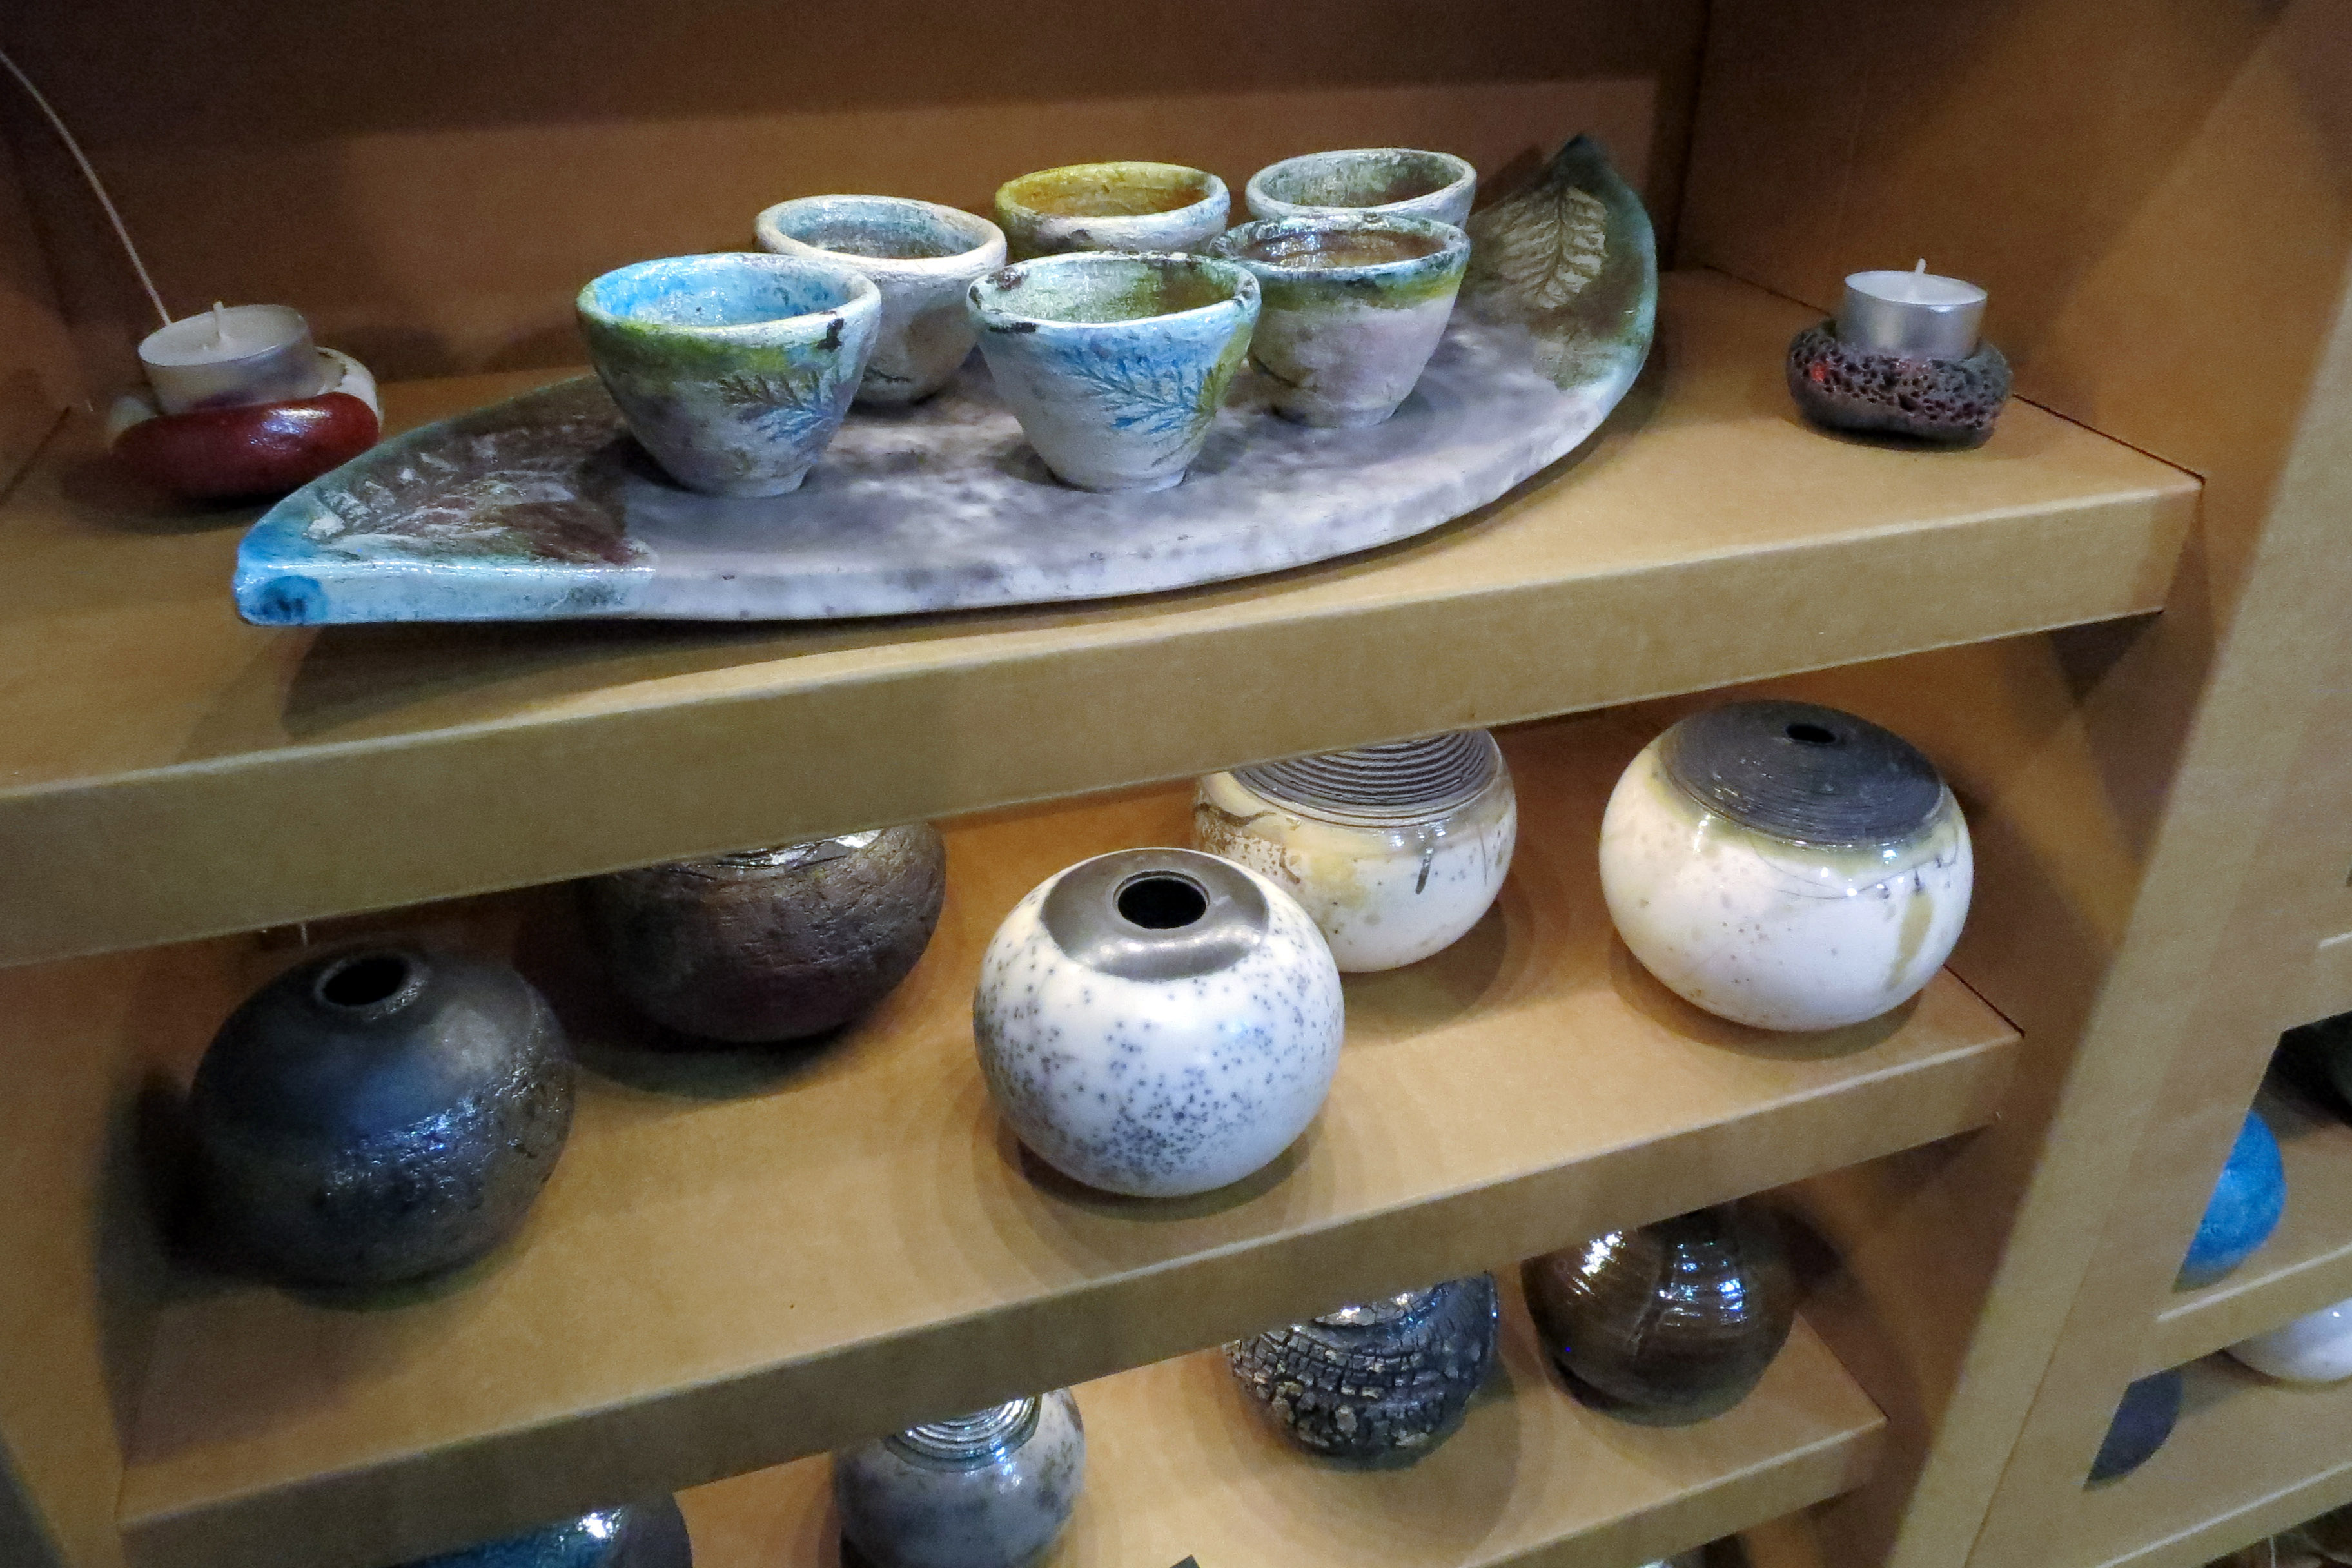 Ceramics on Paper Shelves - L'Artigiano in Fiera: Exhibition and Fair in Milan